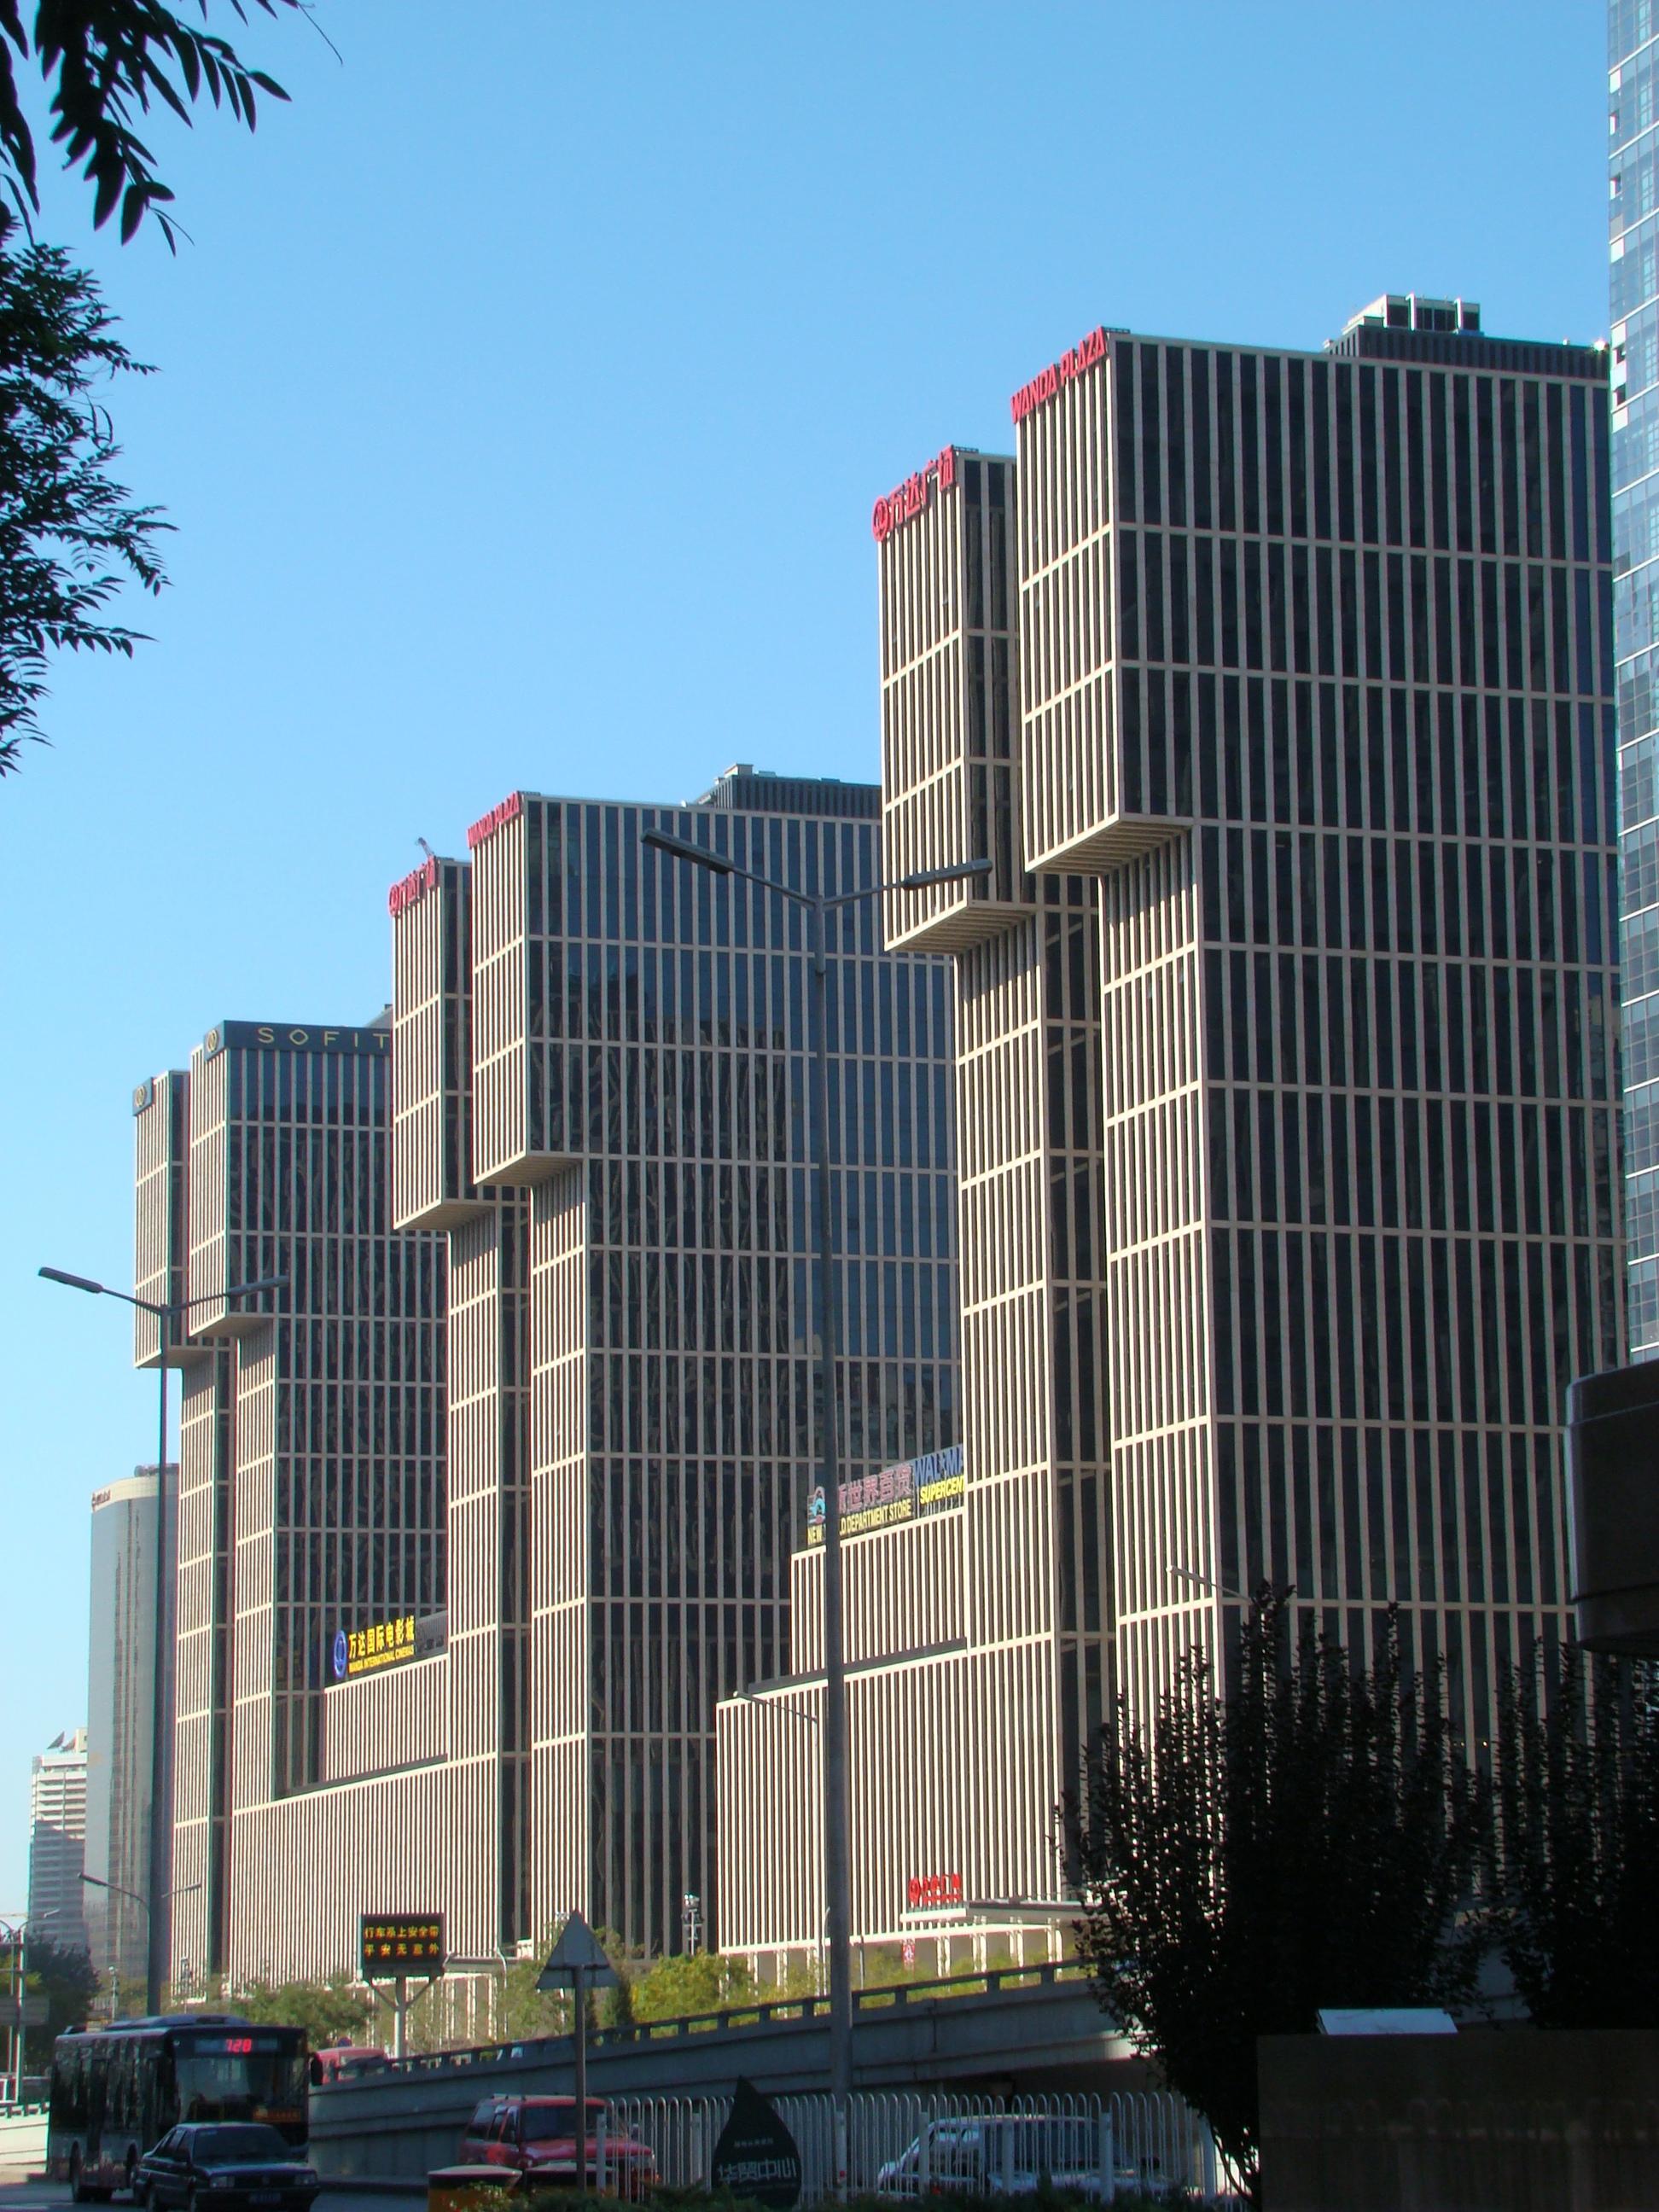 Beijing Wanda Plaza (Headquarters of Wanda Group and Wanda Cinemas) - Includes Wal-Mart, Wanda Cinemas, and Sofitel (Photo By Dennis Deng - https://www.flickr.com/photos/42629902@N00/2314605112, CC BY-SA 2.0)